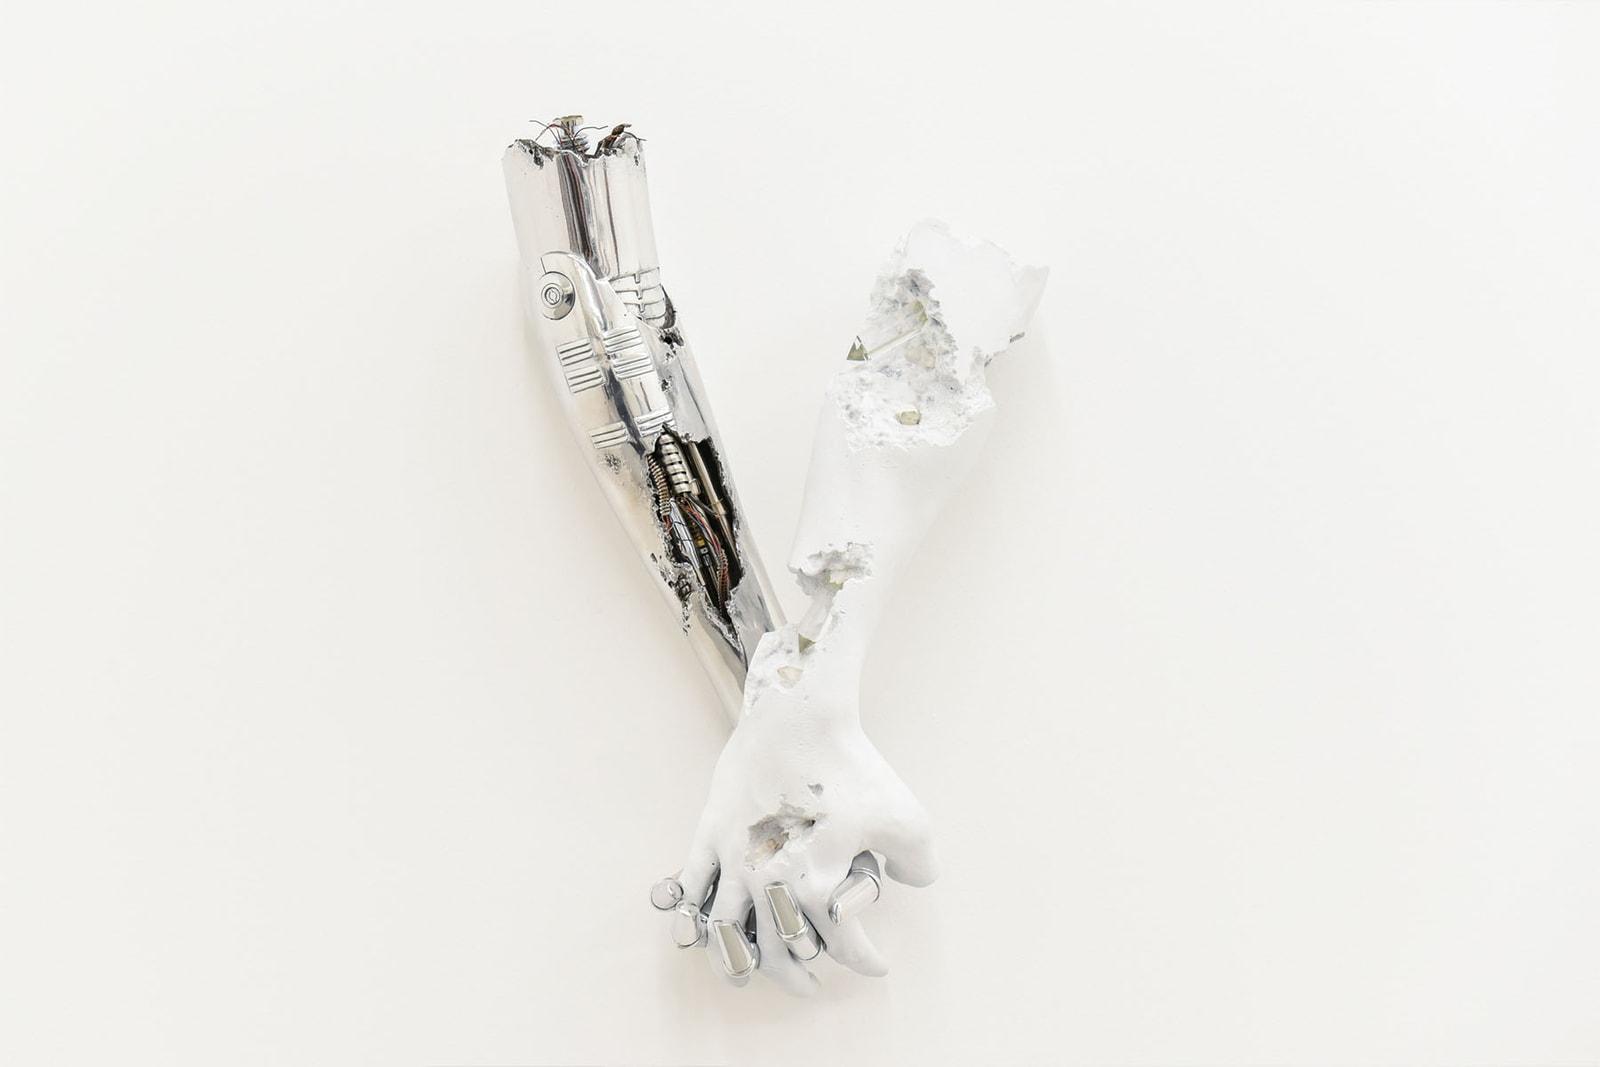 2Gのオープニングを飾る空山基とダニエル・アーシャムが思うアートとファッションの関係性 インタビュー:空山基とダニエル・アーシャムが思うアートとファッションの関係性